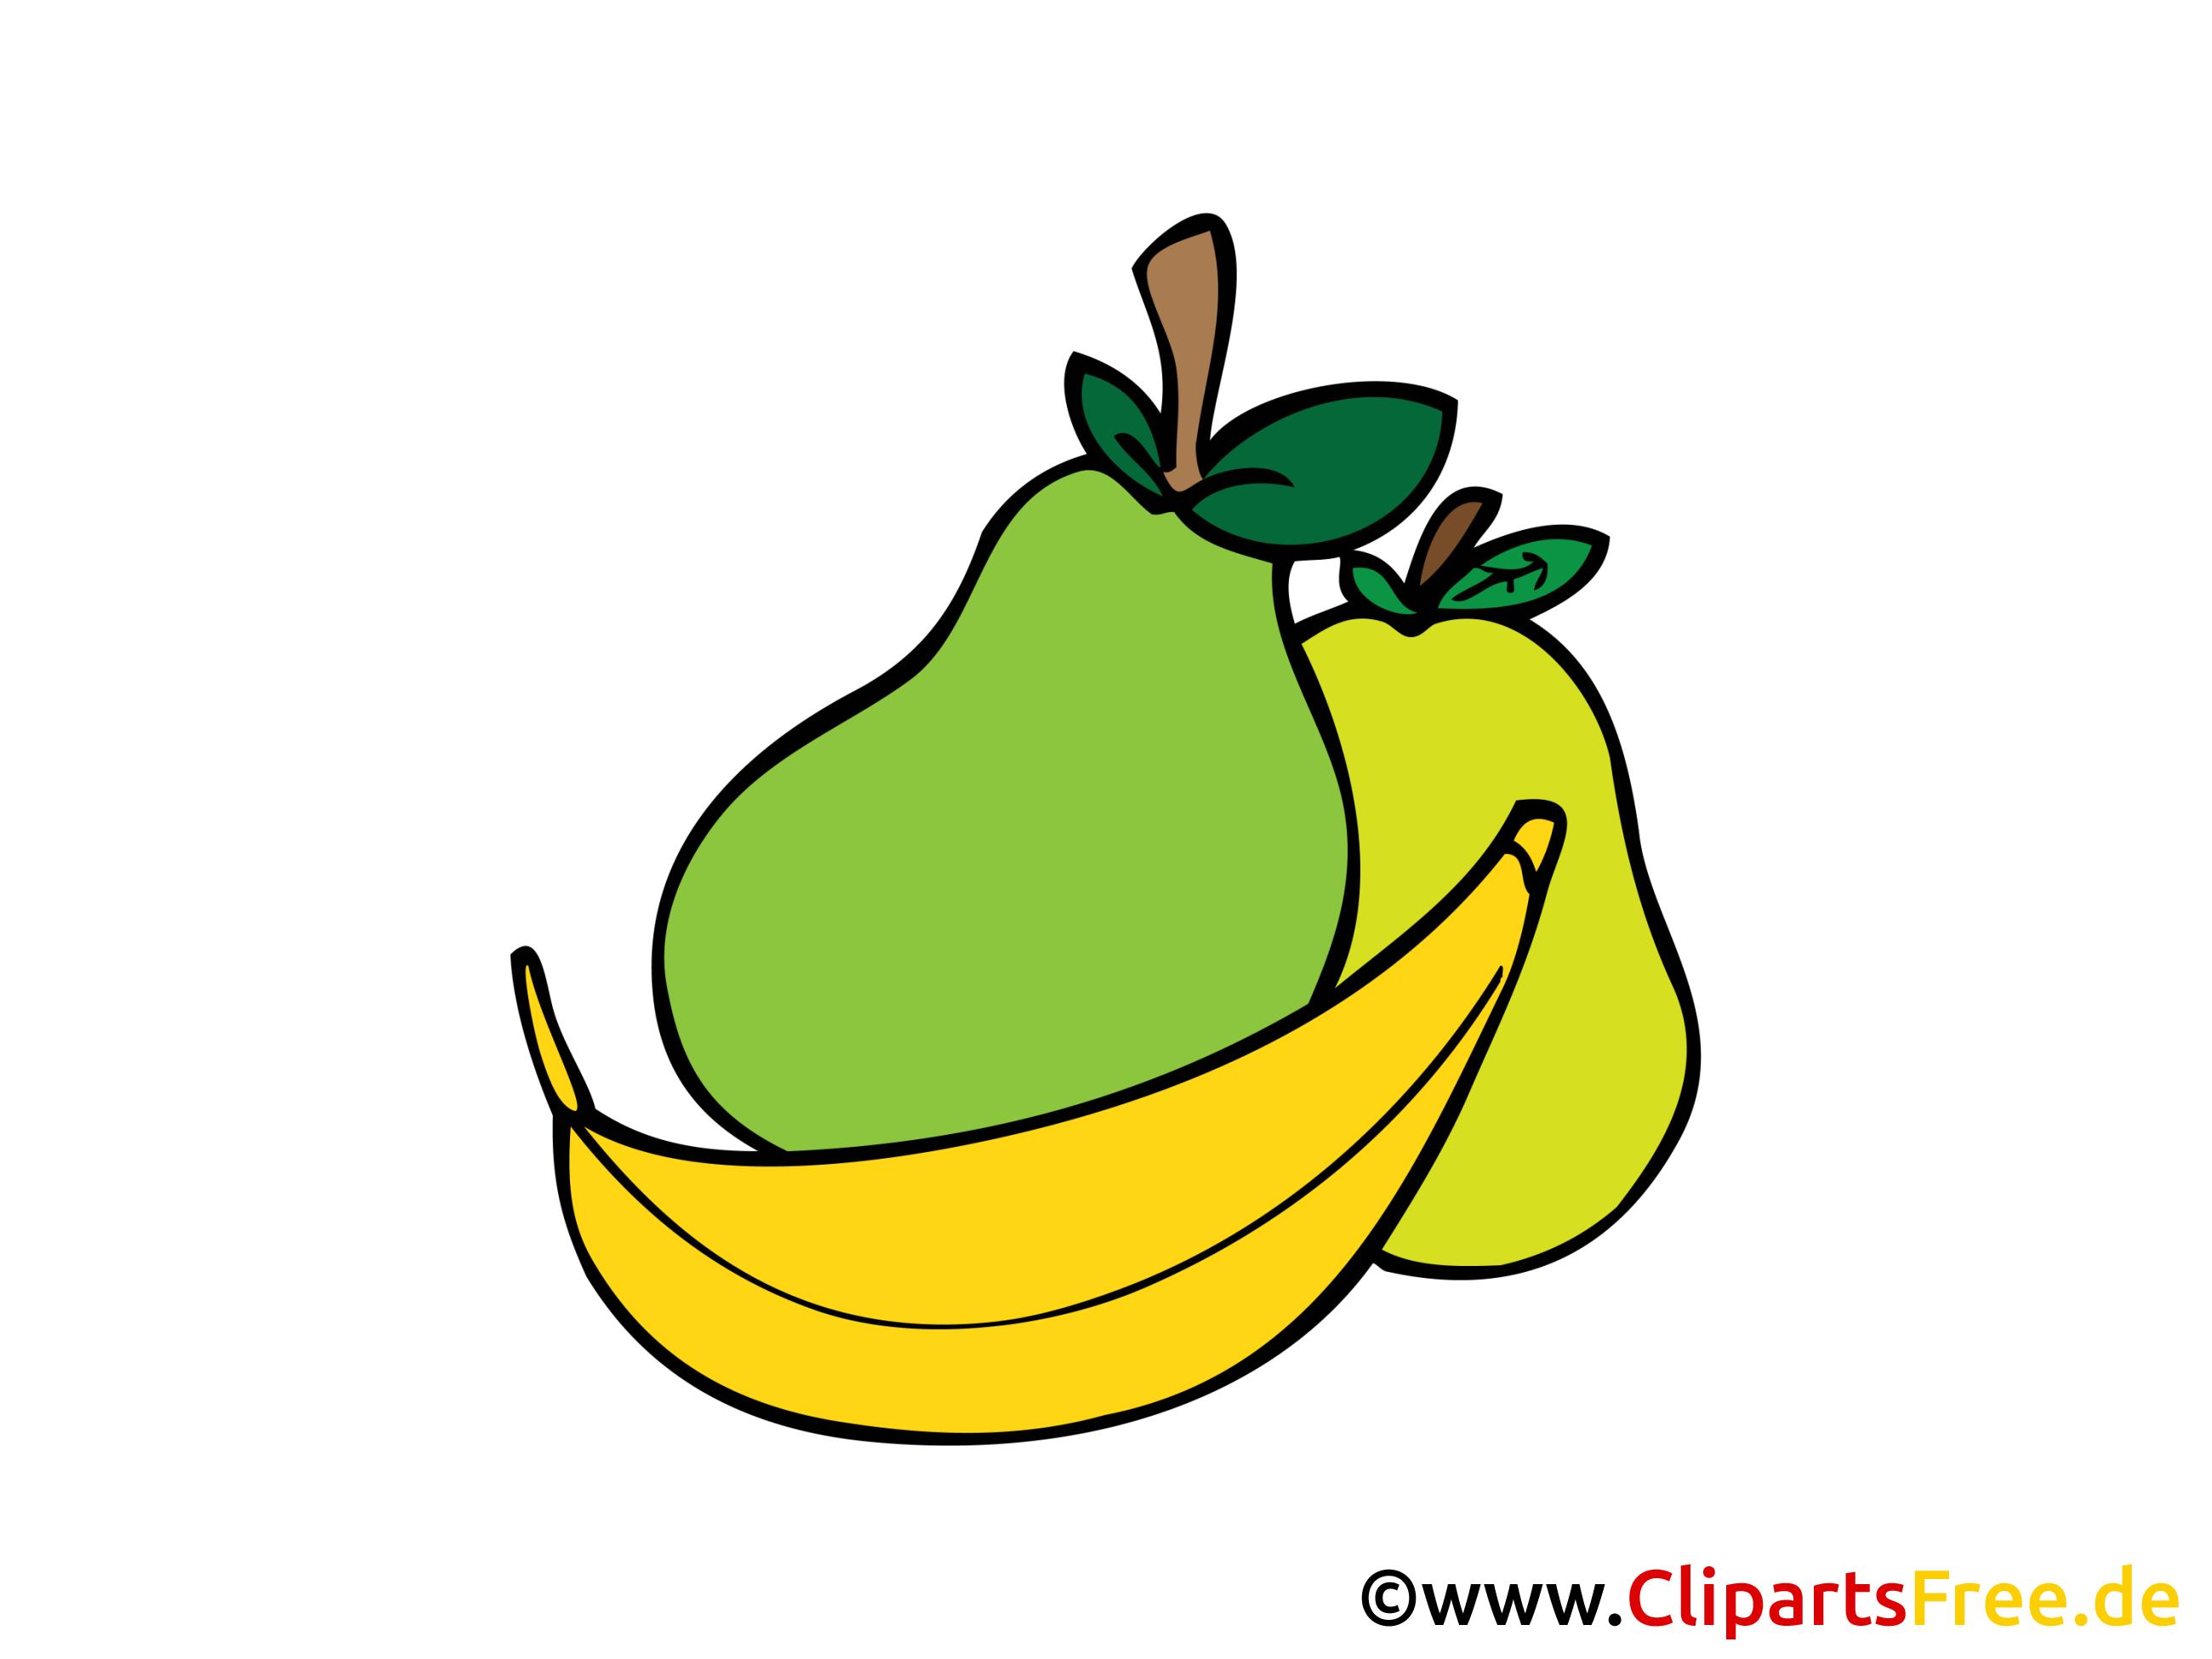 Obst Cliparts in Hochaufloesung.